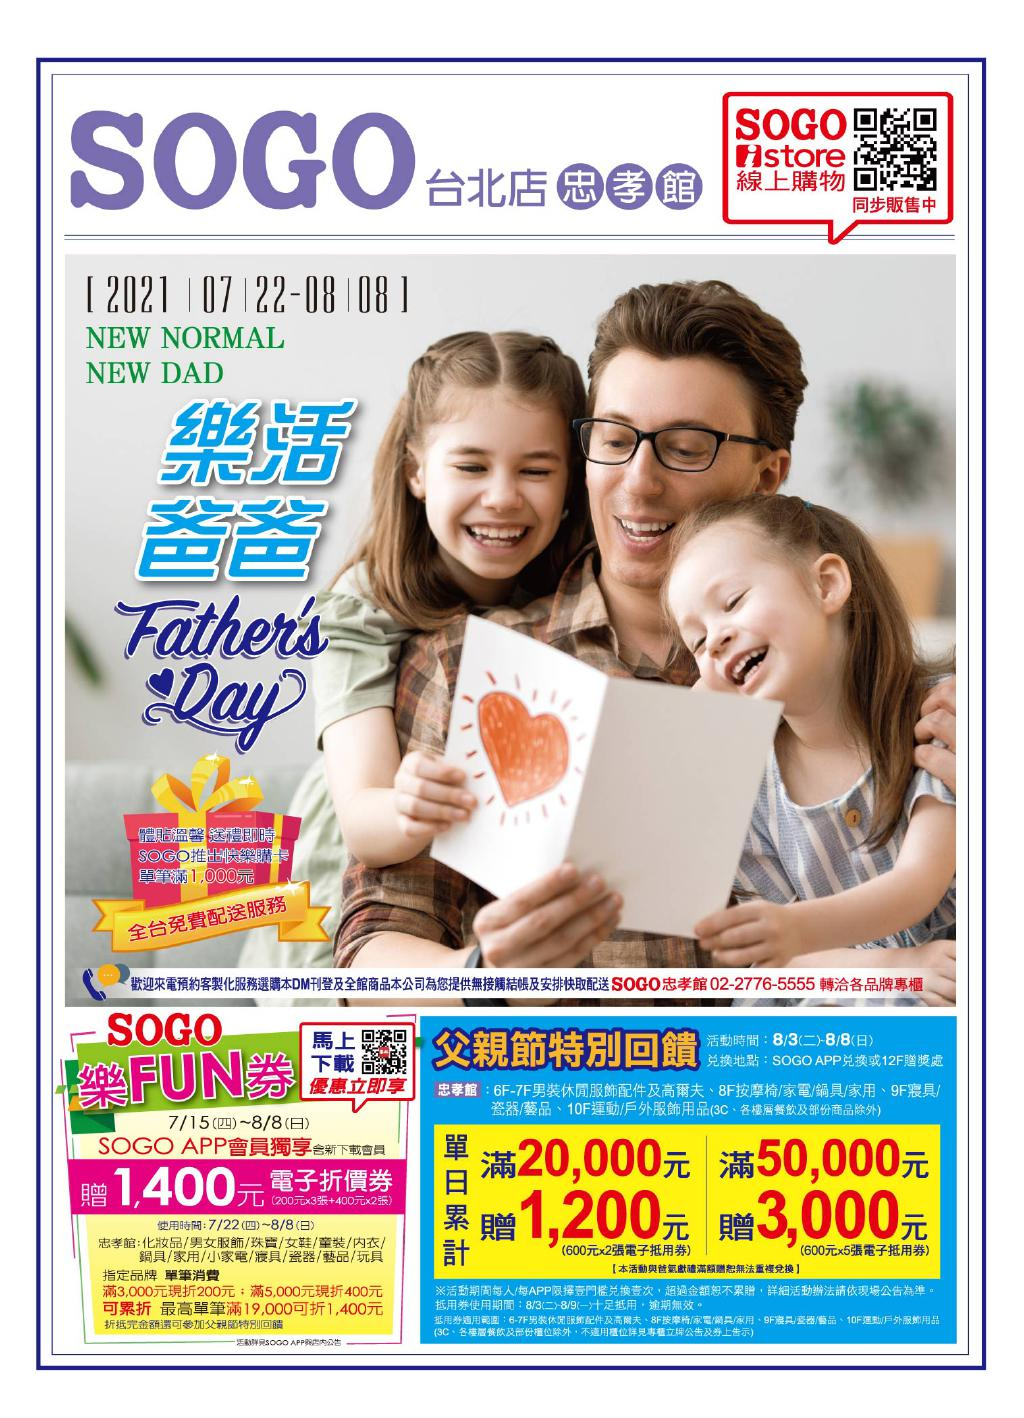 SOGO《台北忠孝館》DM 「樂活爸爸 Father's Day」【2021/8/8 止】